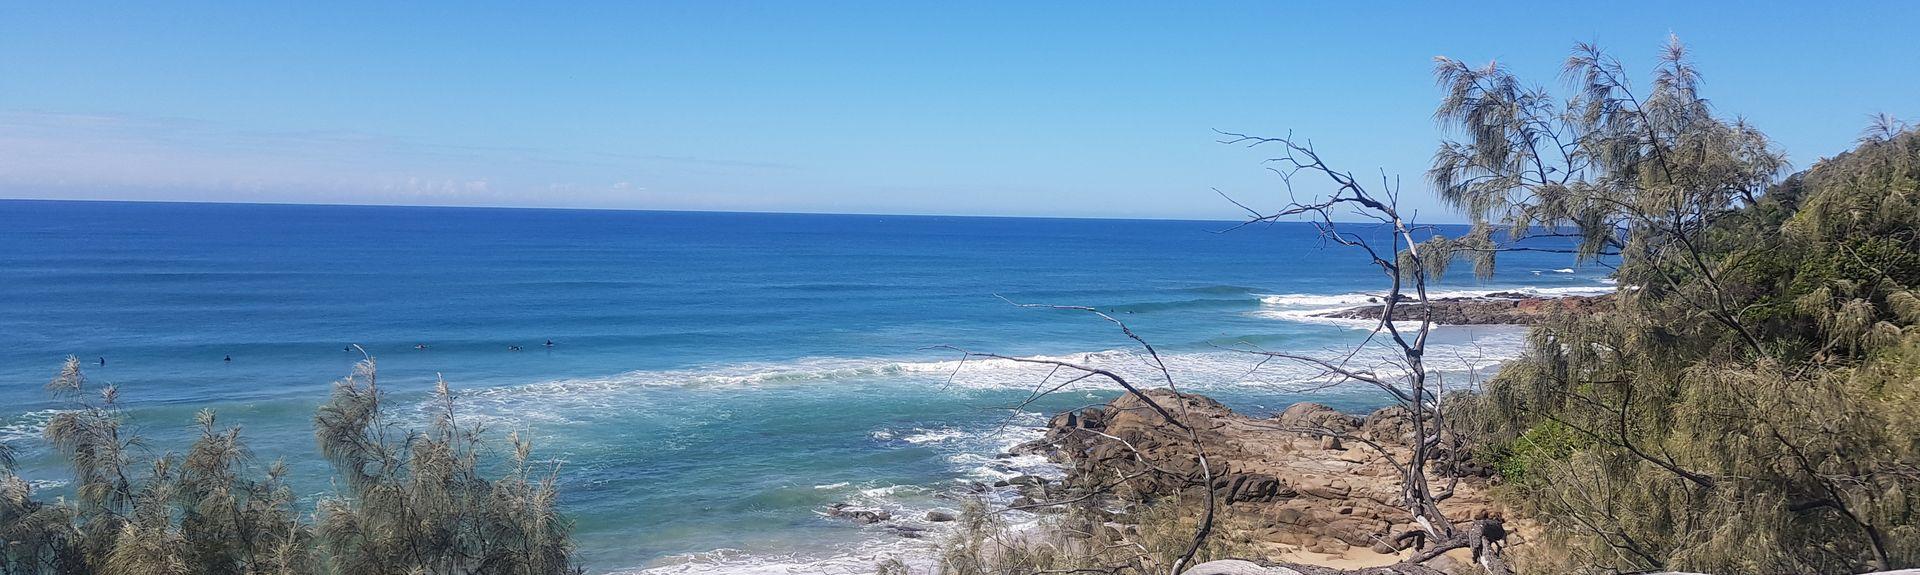 Pacific Paradise, QLD, Australia